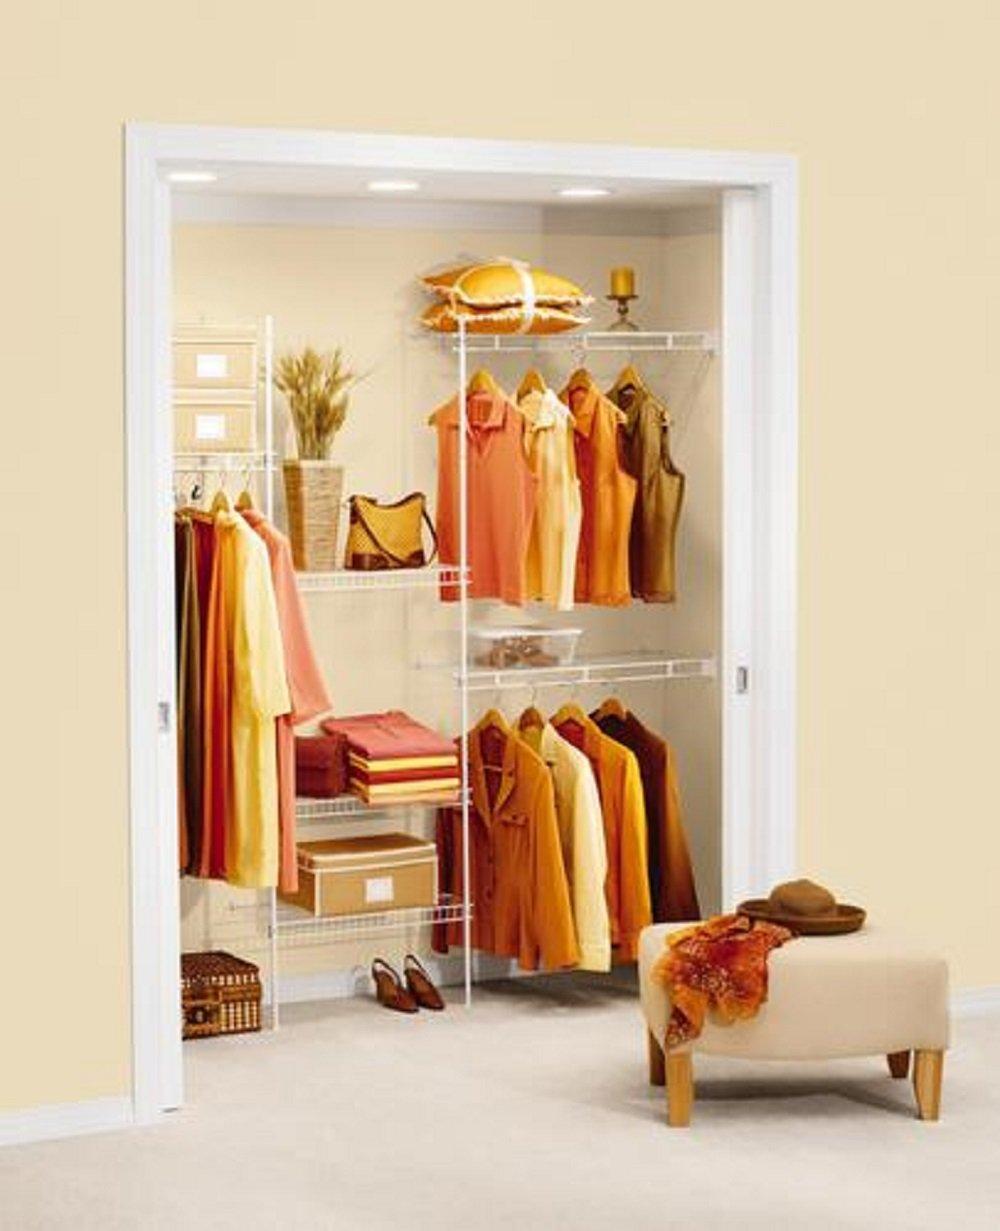 Rubbermaid Closet Organizer 5' - 8' - White